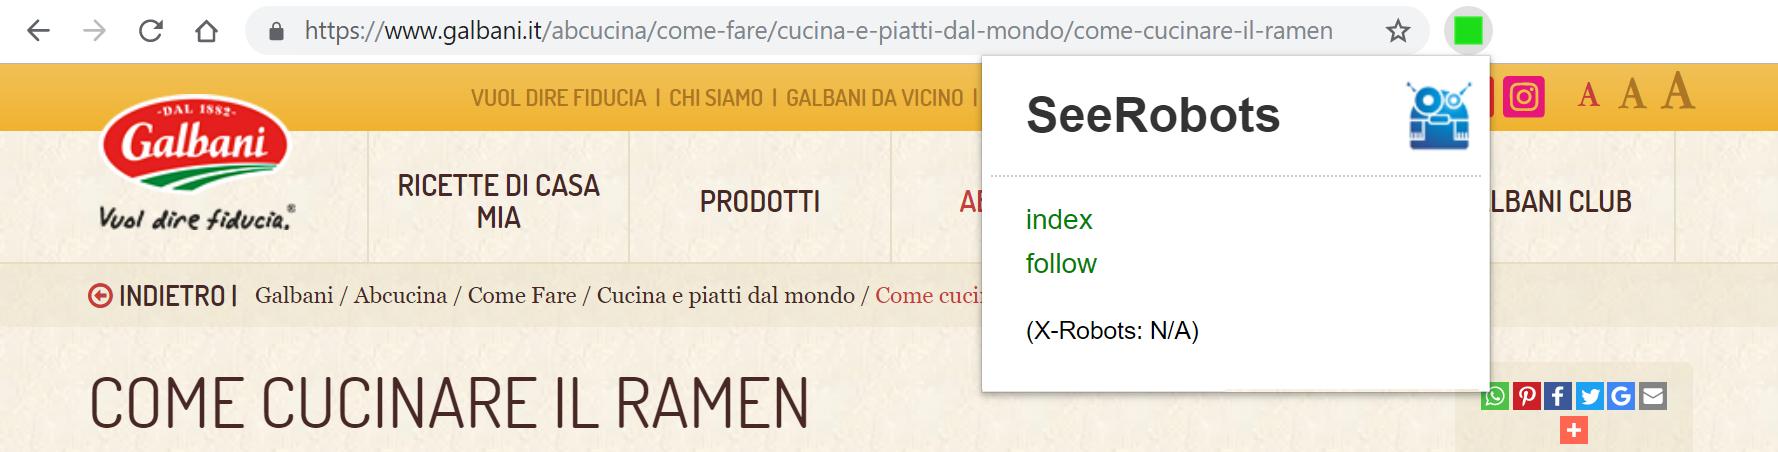 galbani.it index-follow